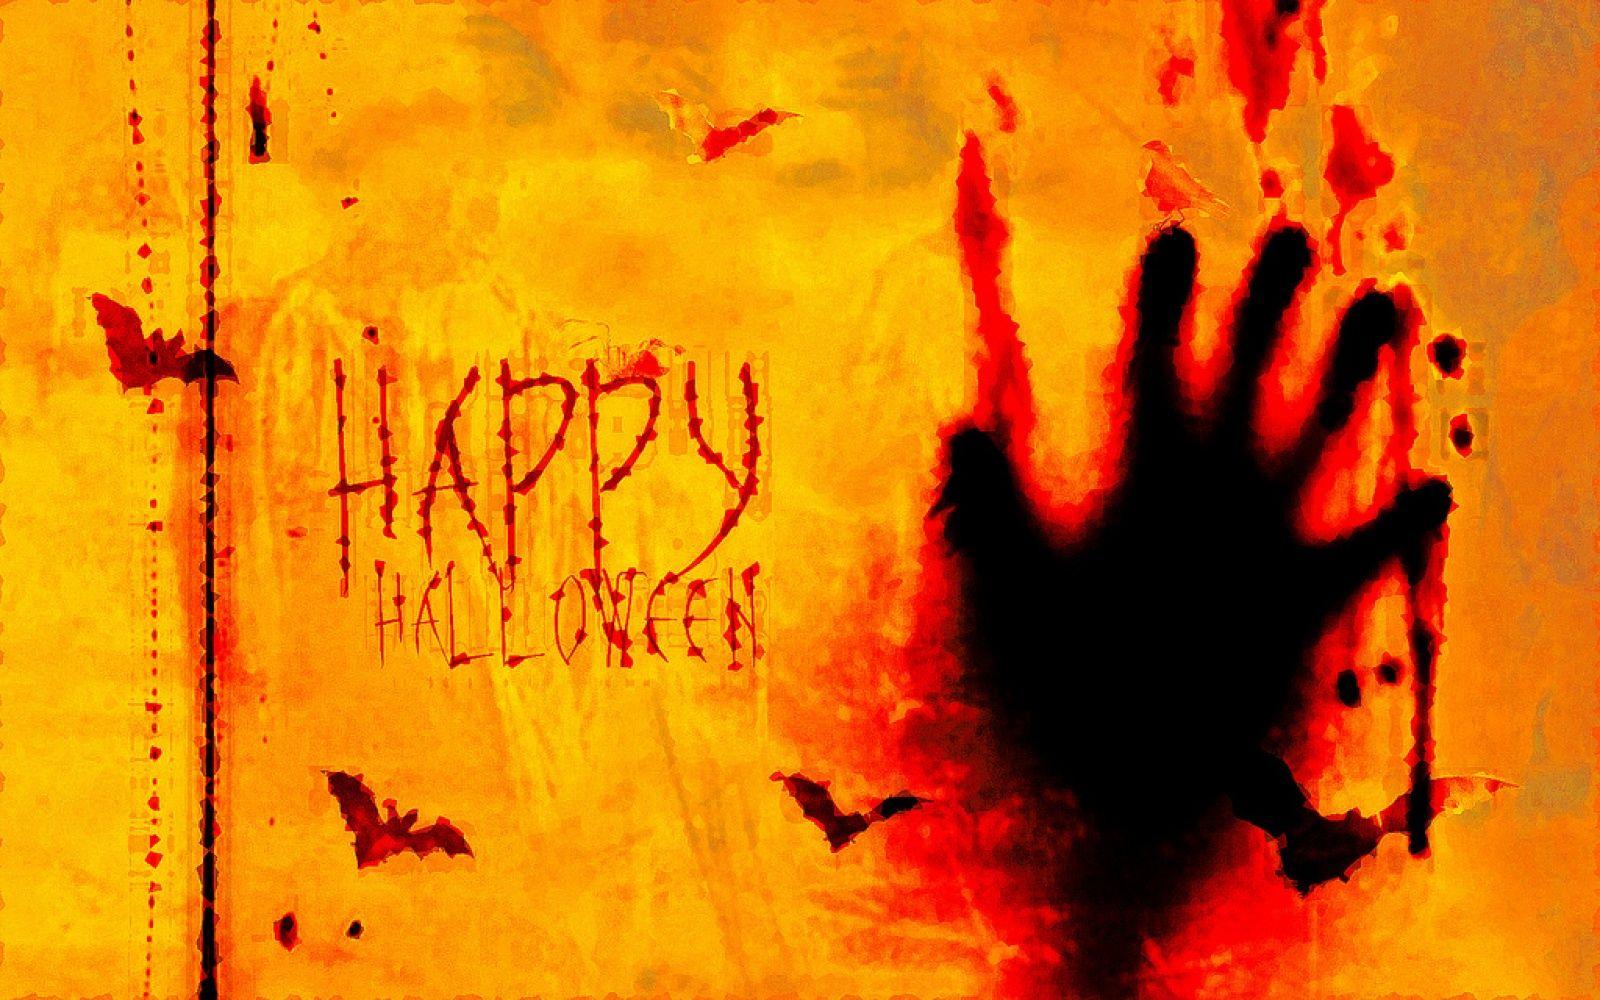 Fantastic Wallpaper High Quality Halloween - 61a6c0d8598d6dbc4c3ebac76e45abc2  Gallery_229059.jpg